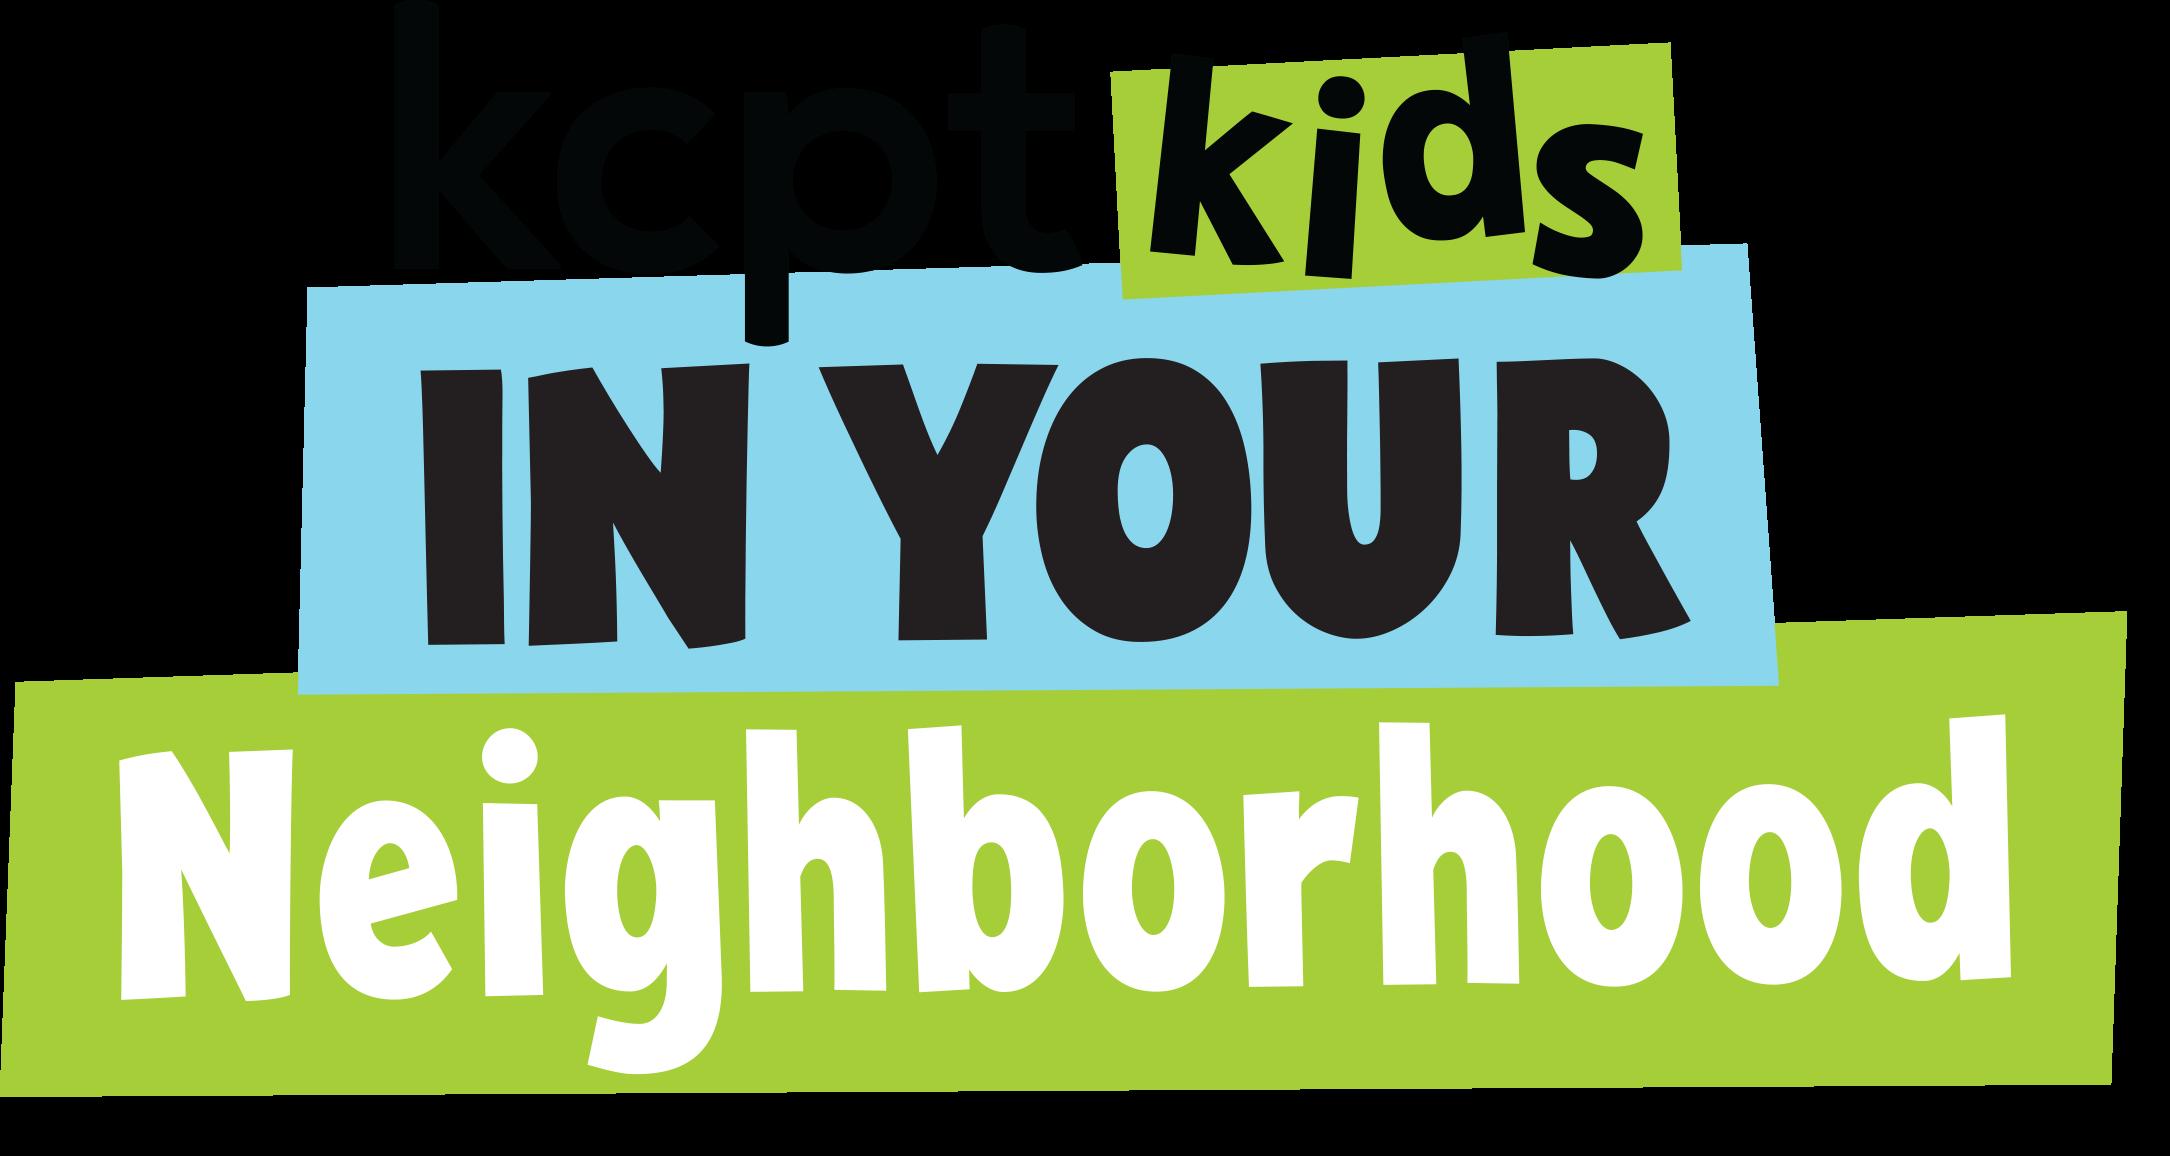 kcptkids in your neighborhood